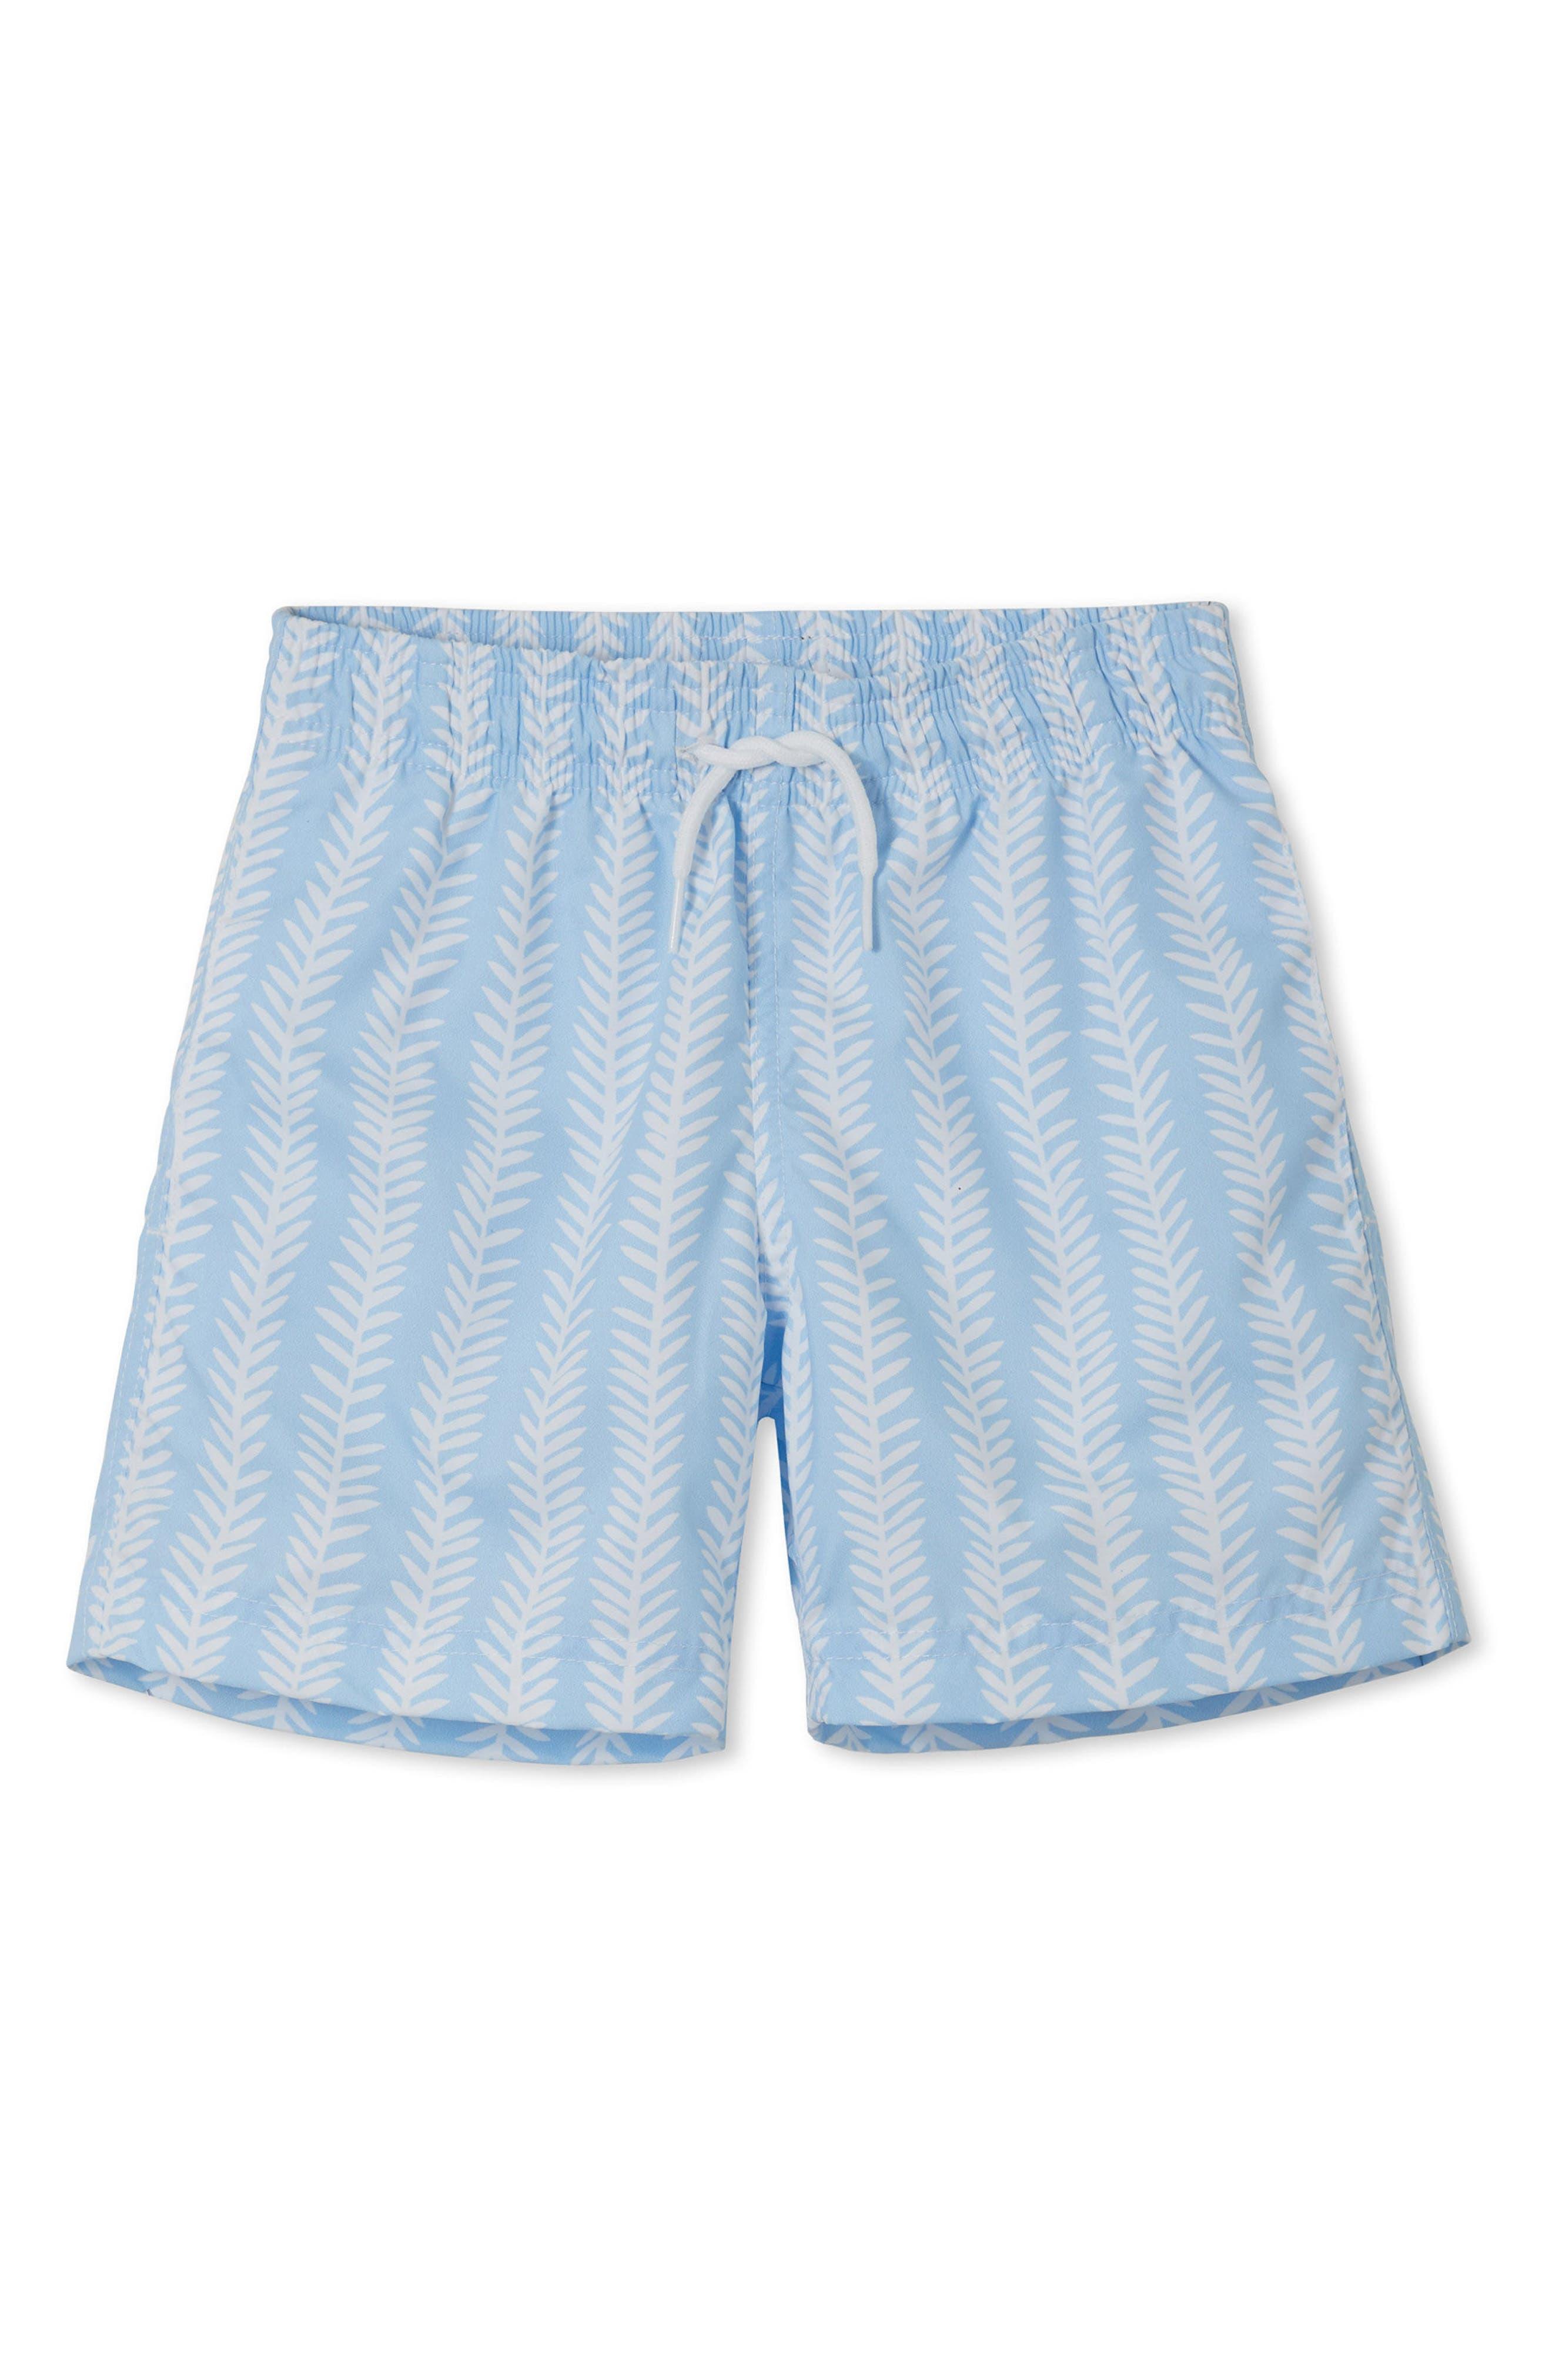 Main Image - Stella Cove Coral Laurel Swim Trunks (Toddler Boys & Little Boys)